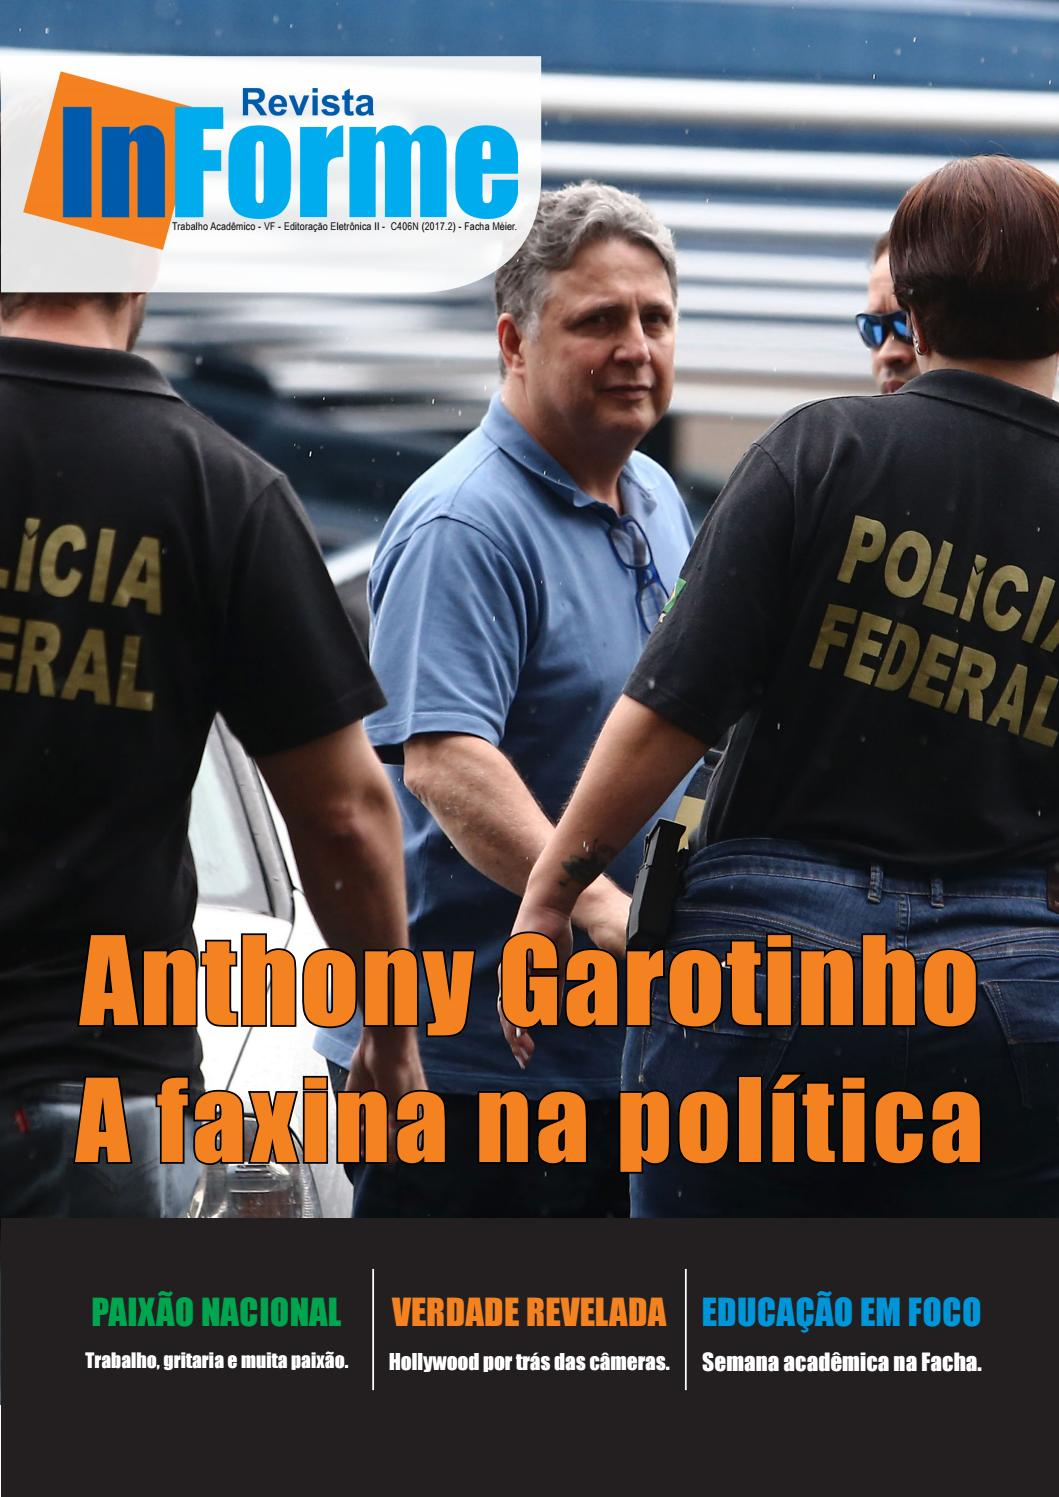 ef862c07382ff Revista informe c406n 2017 2 by Gilvan Nascimento - issuu